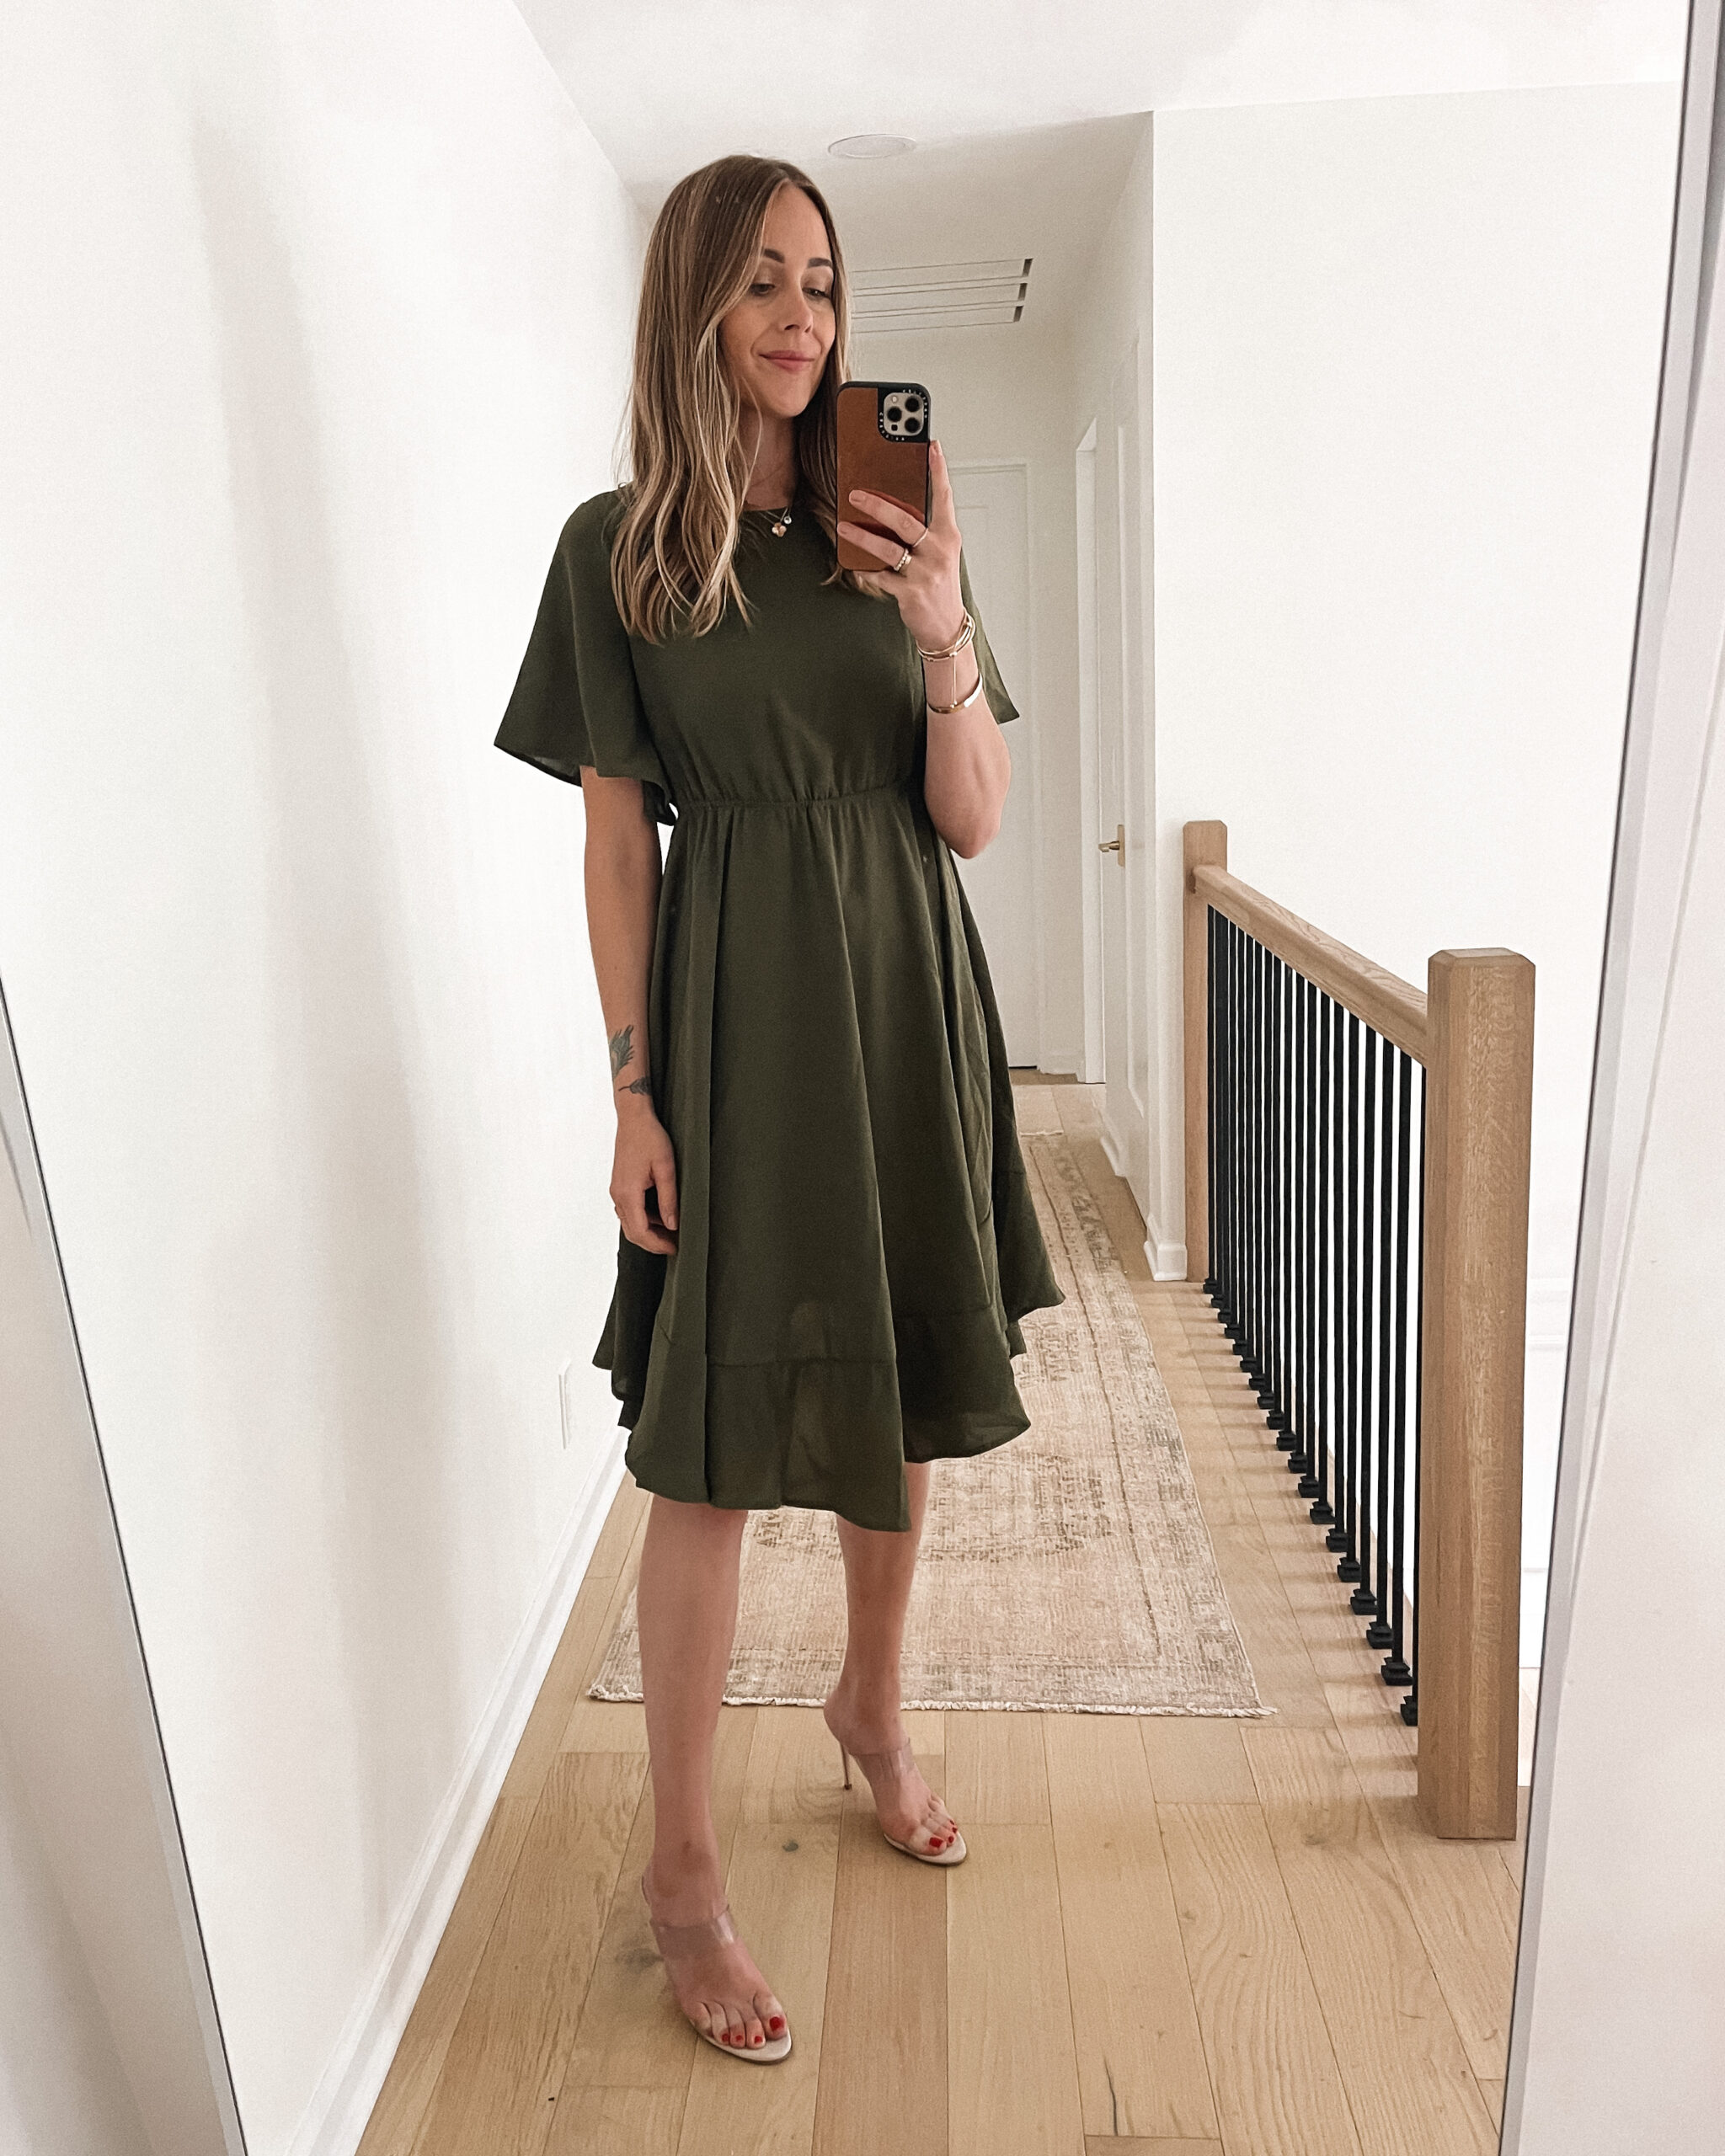 Fashion Jackson Wearing Amazon Fashion Olive Green Ruffle Midi Dress Clear Heeled Sandals